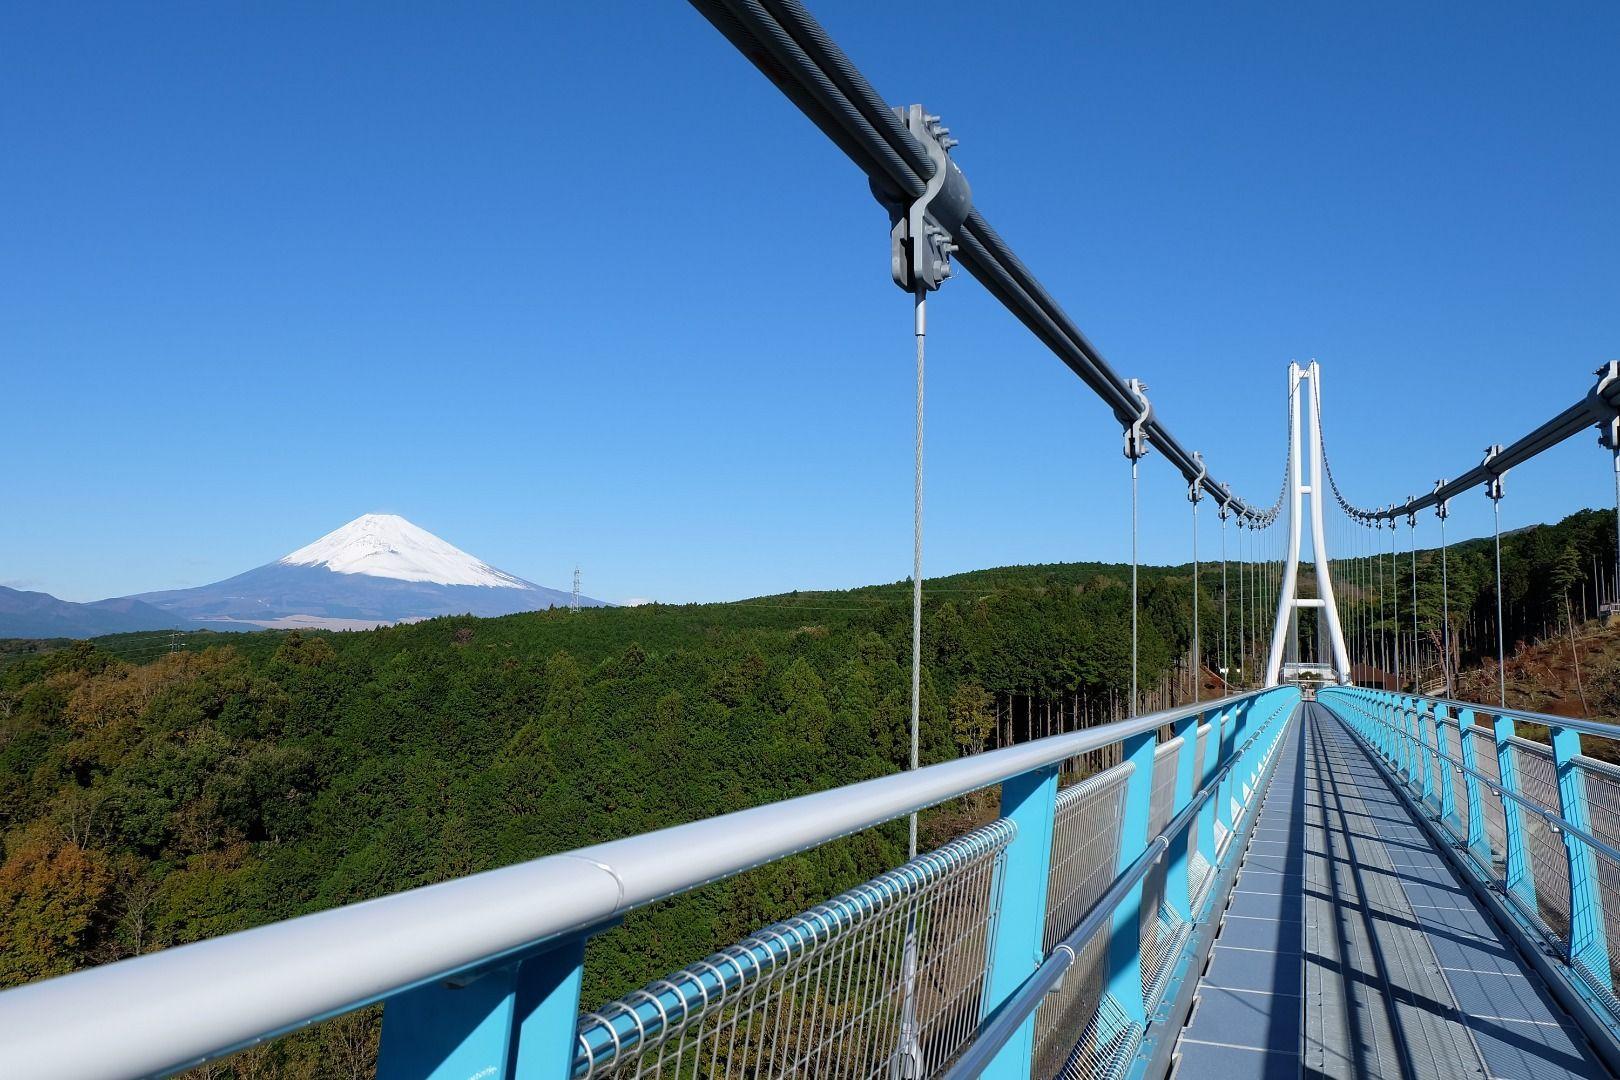 Enjoy celebrity-level views of Mt. Fuji from Shizuoka!Mishima Sky Walk